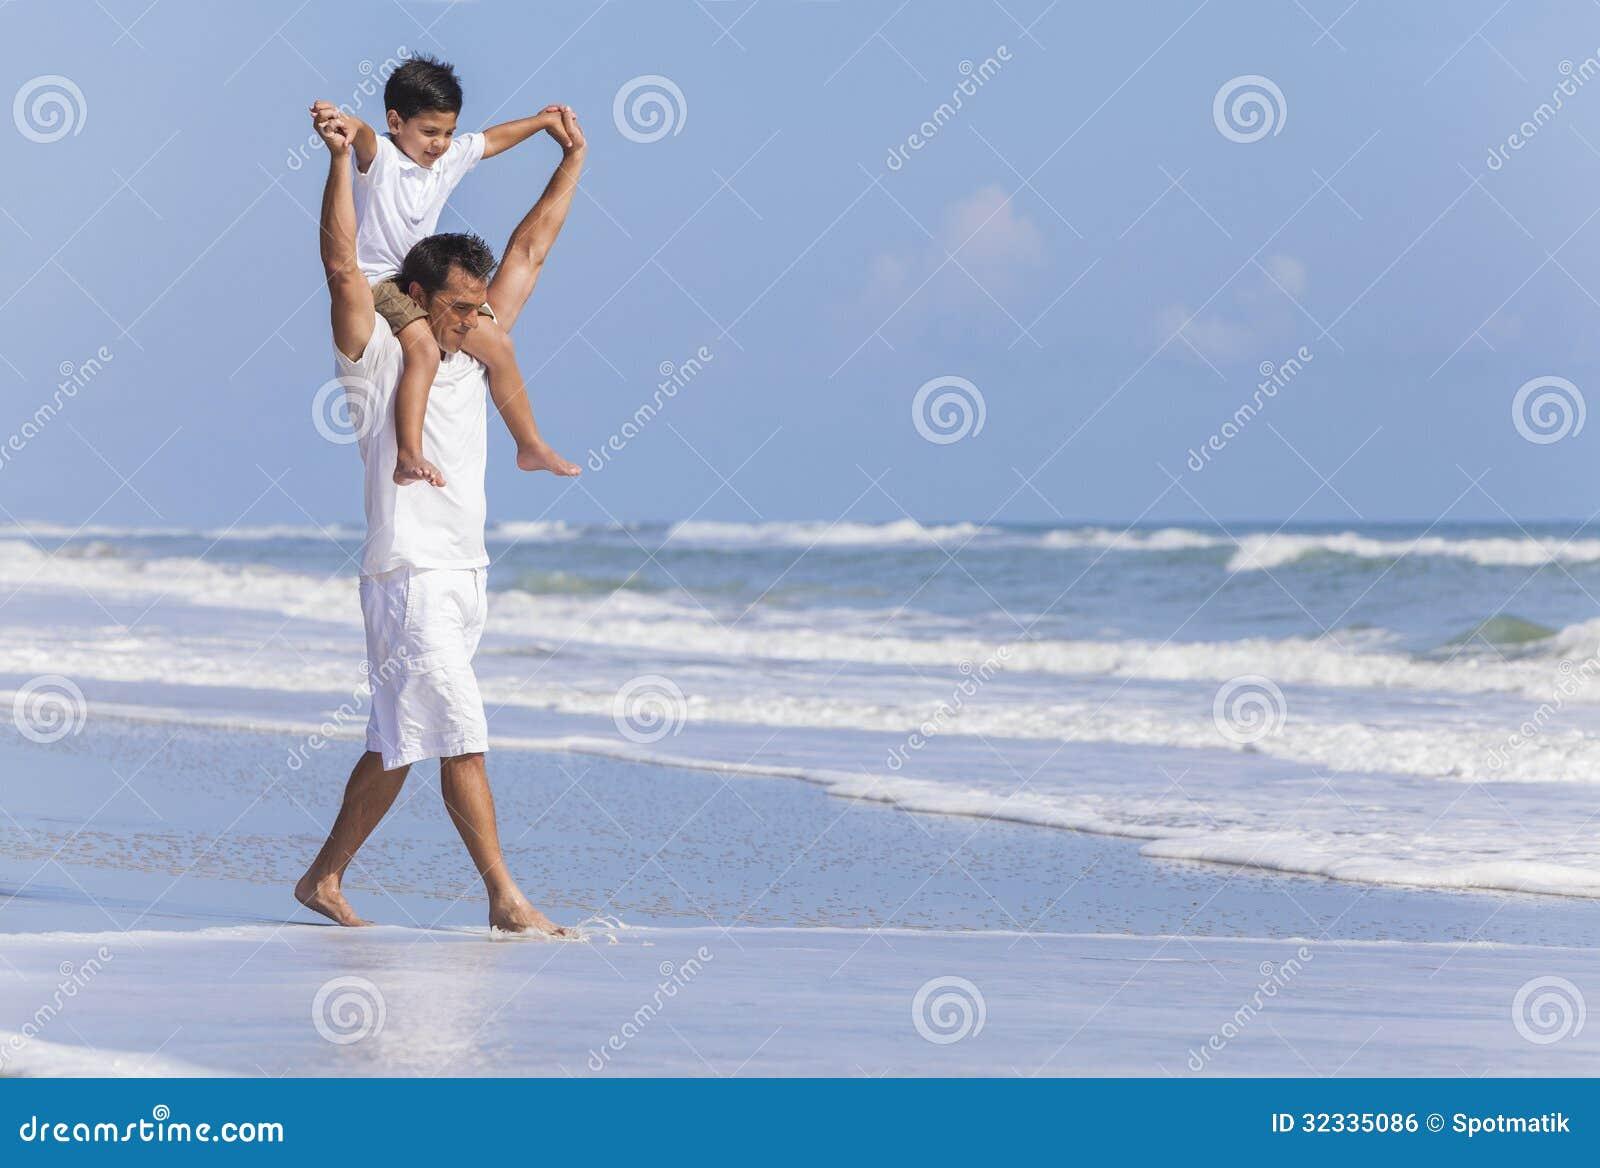 Father Parent Boy Child Family Beach Fun